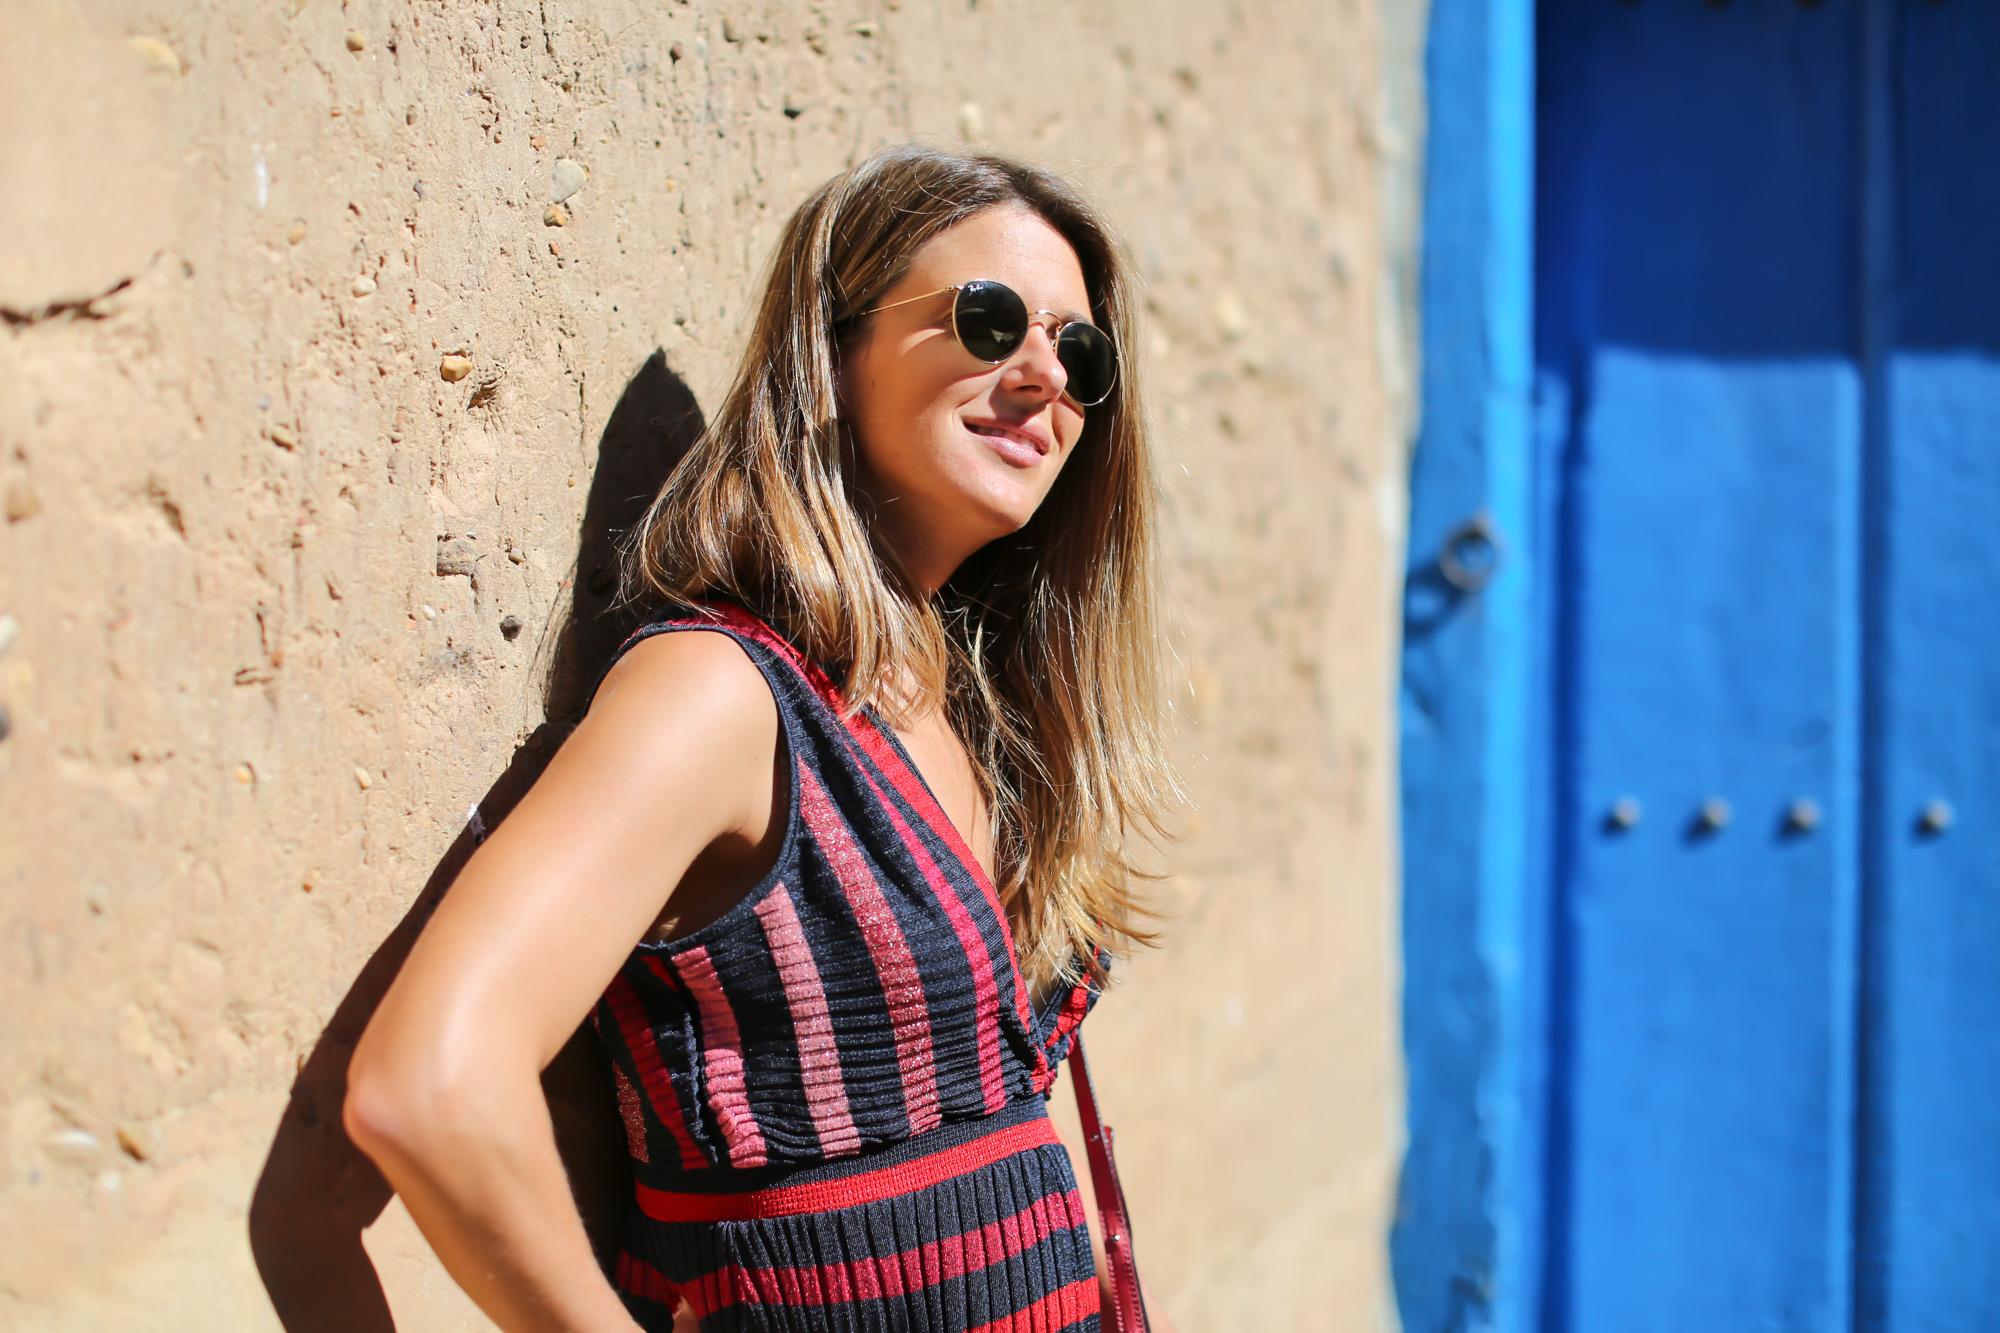 clochet_streetstyle_zara_long_knit_dress_titamad_miniparadisred-2